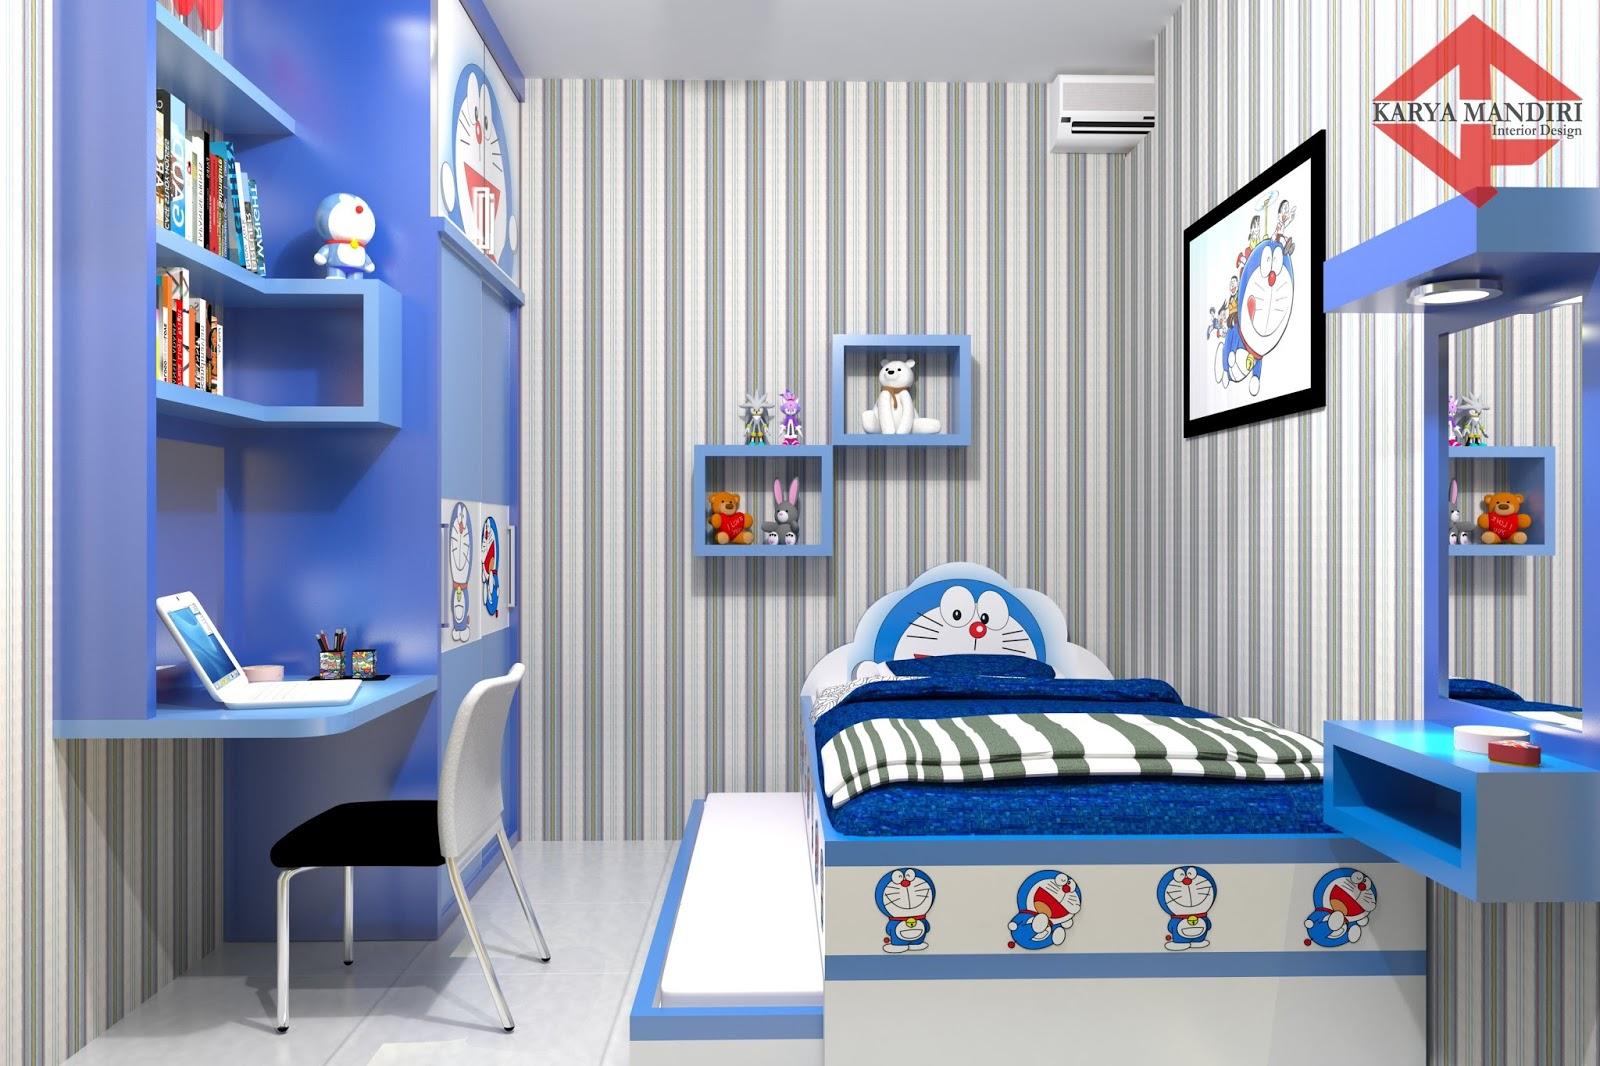 Cv Karya Mandiri Design R Anak